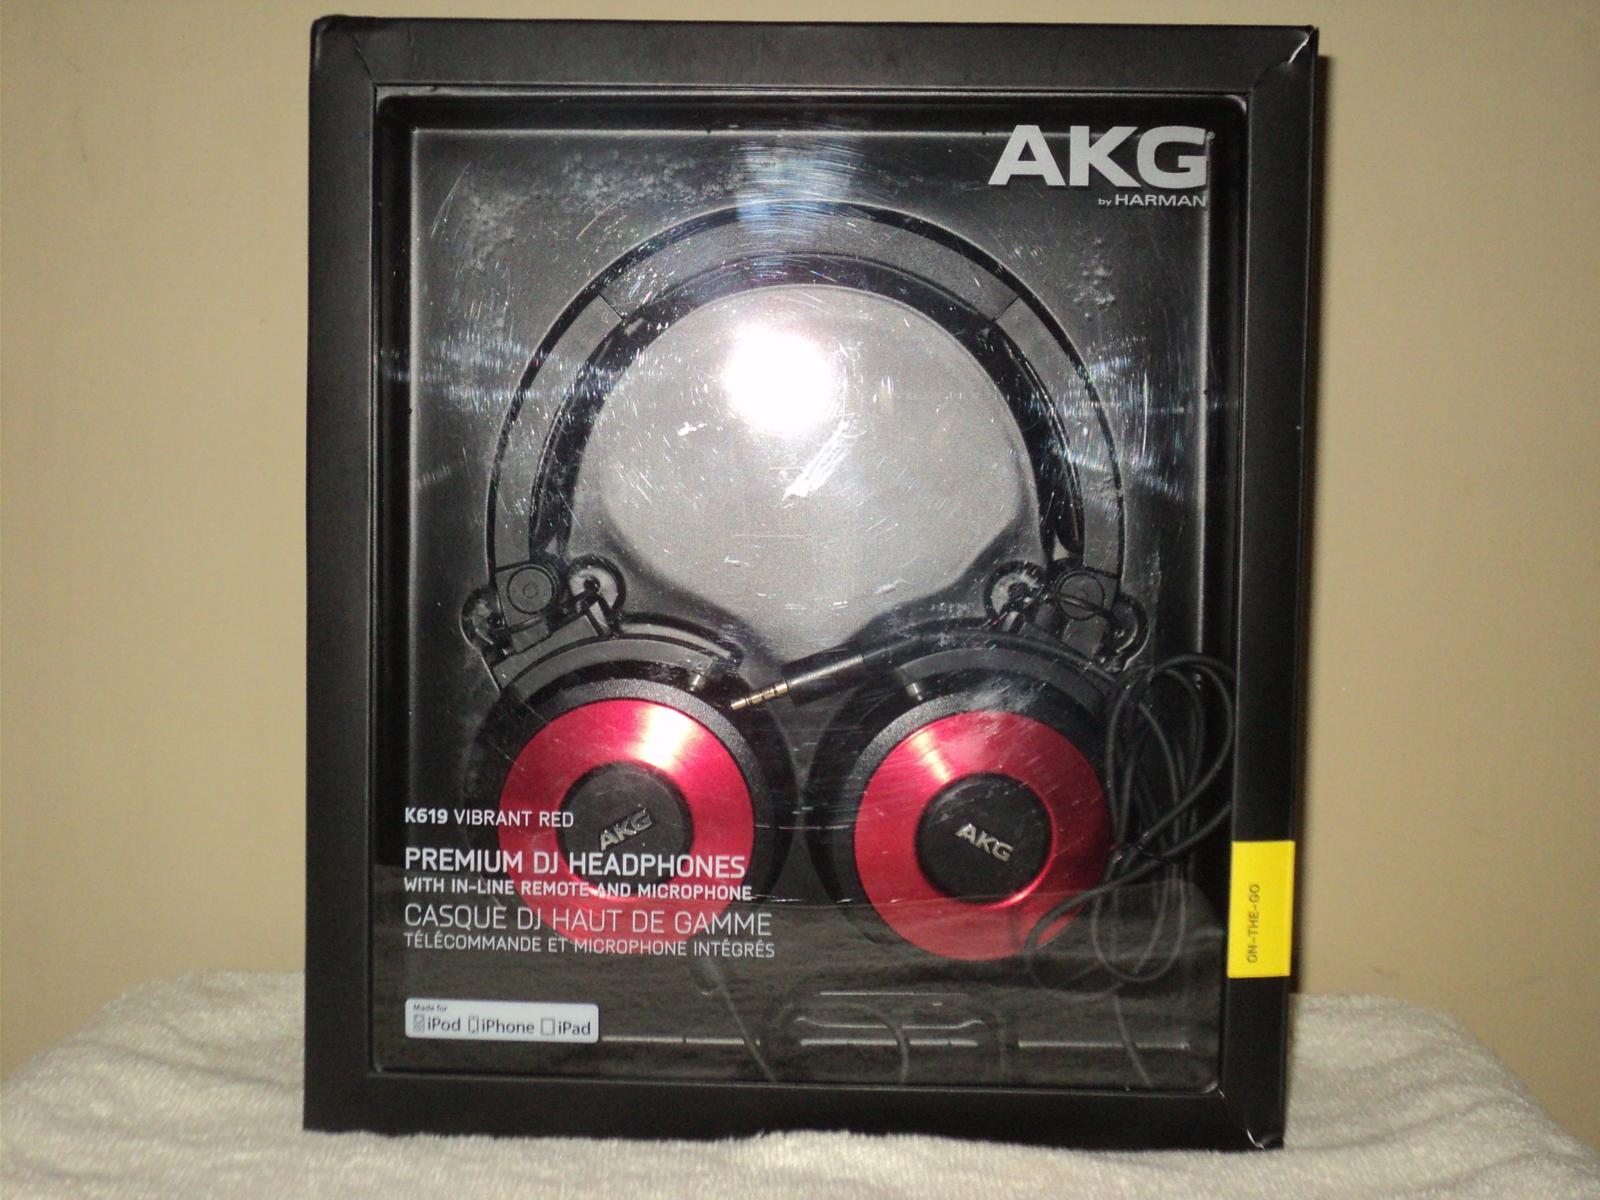 AKG K619 unboxing